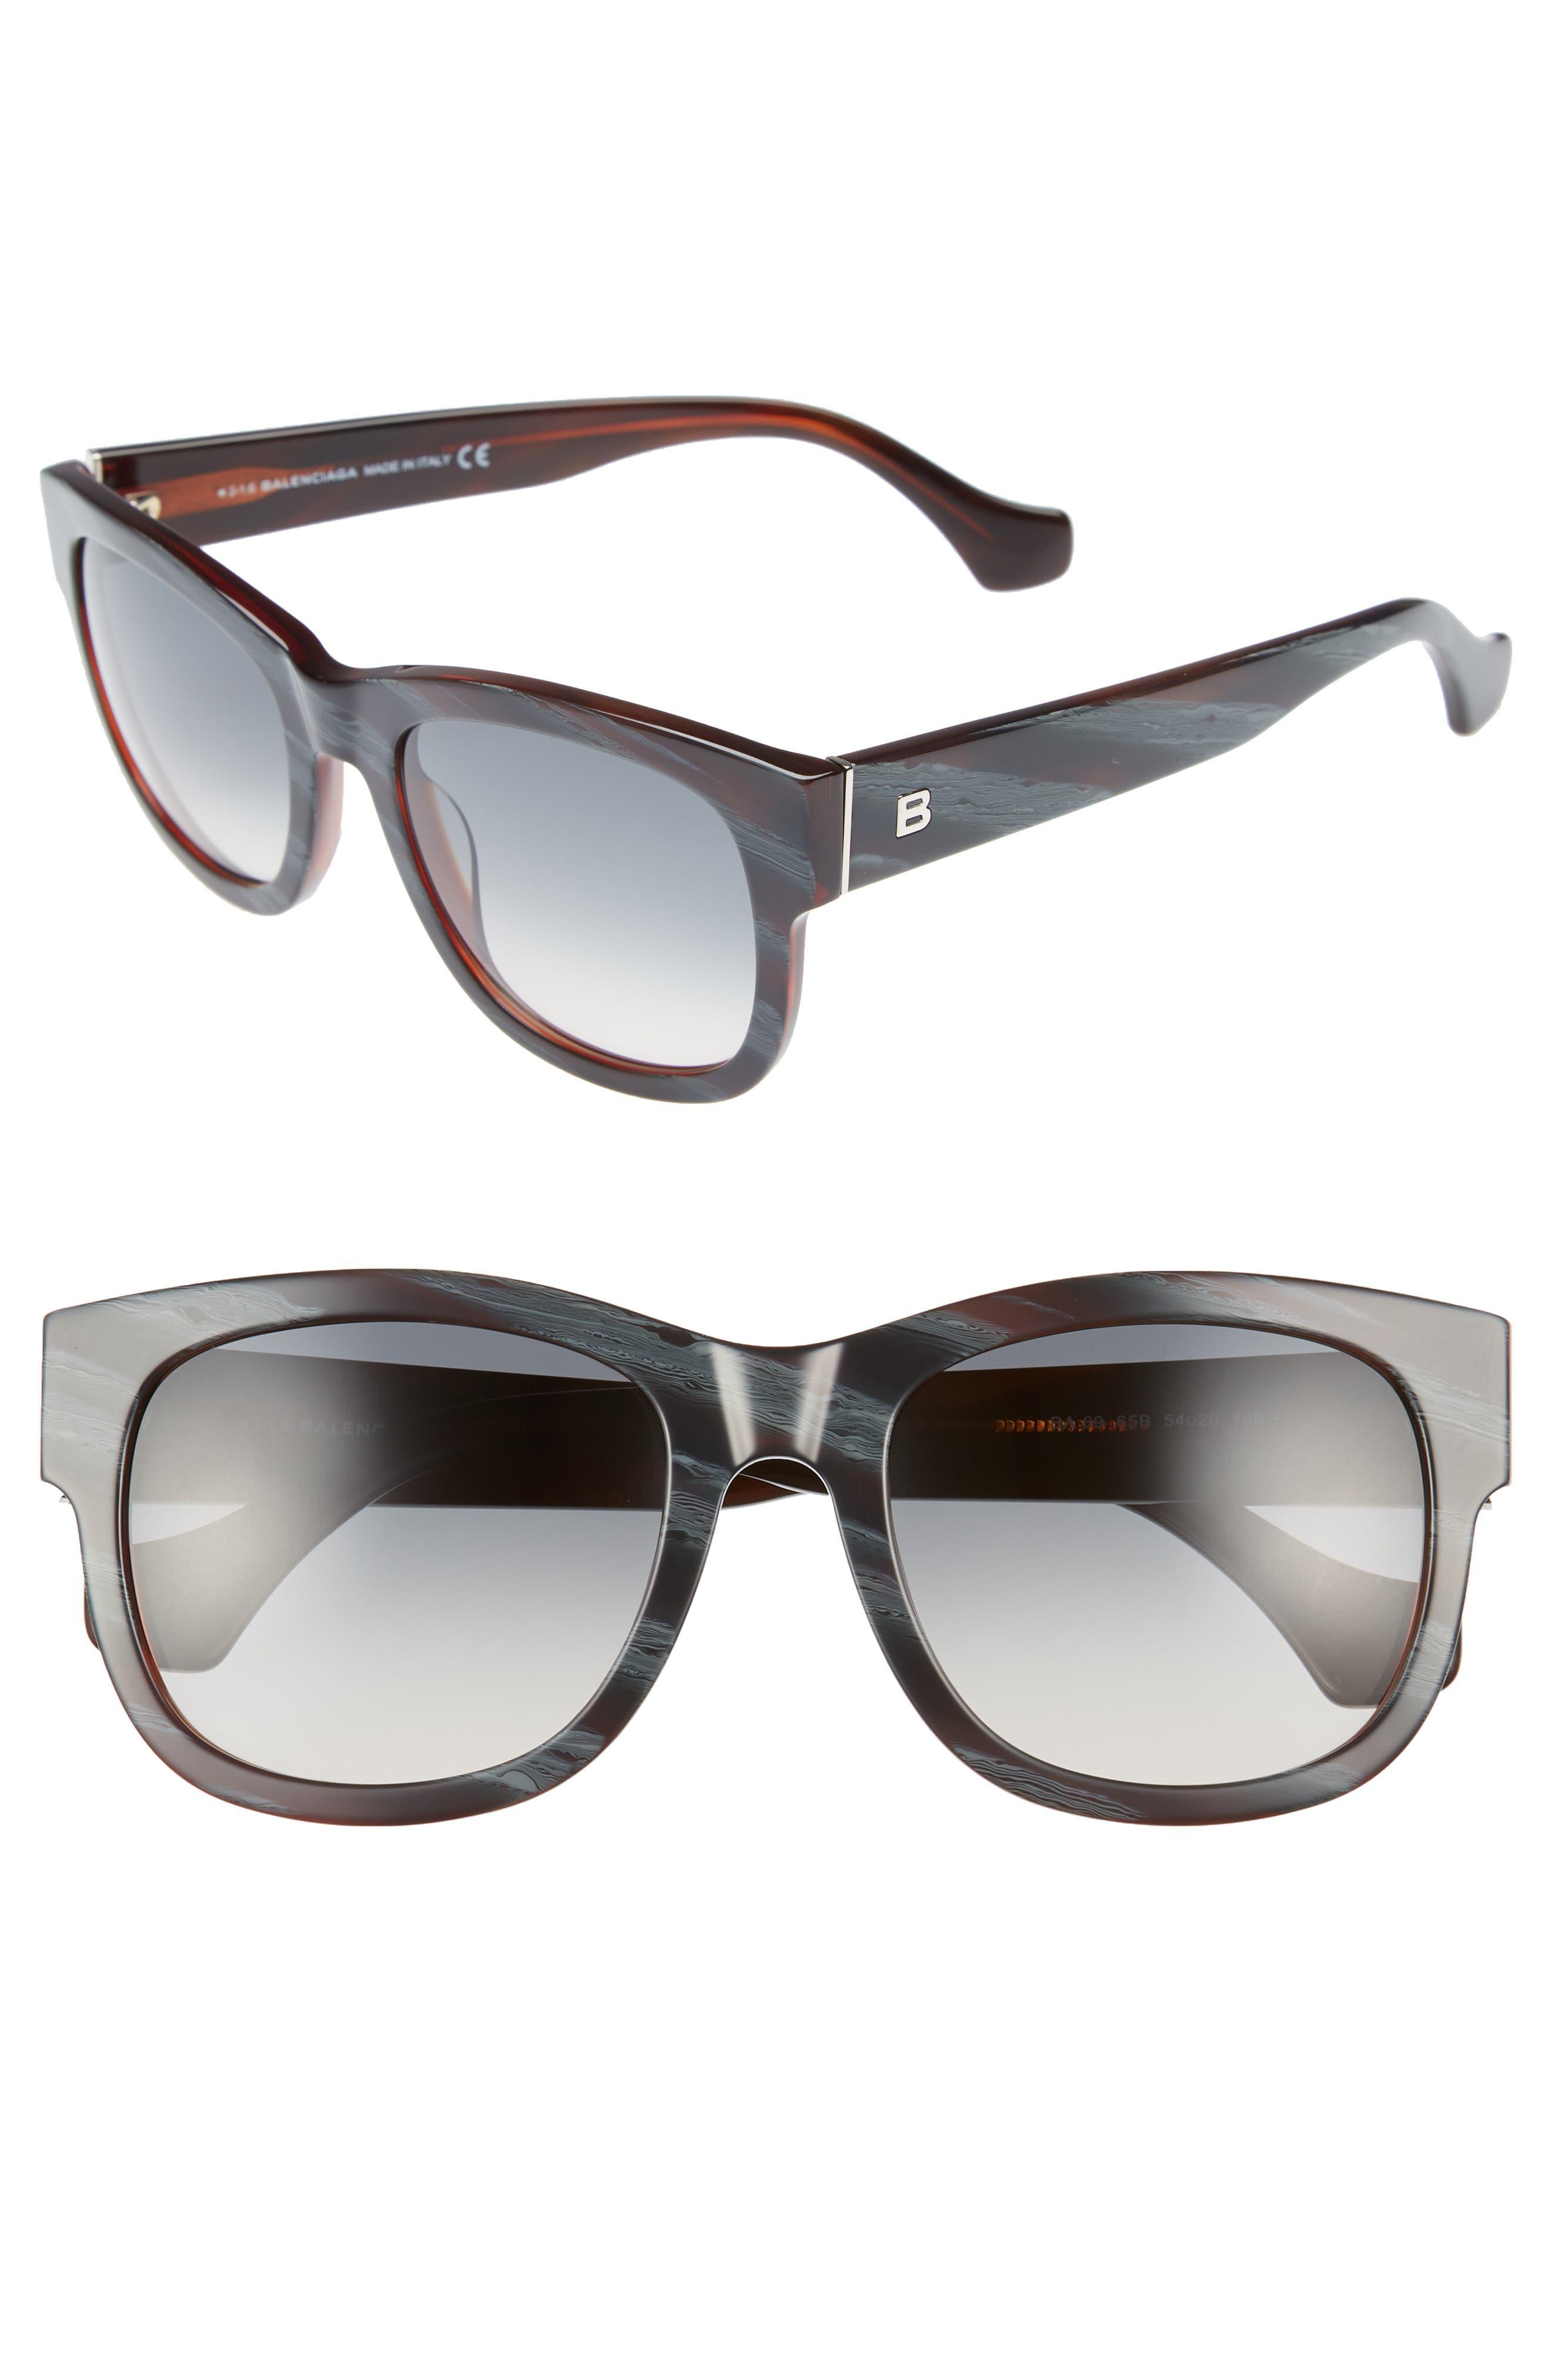 54mm Retro Sunglasses,                             Main thumbnail 1, color,                             400